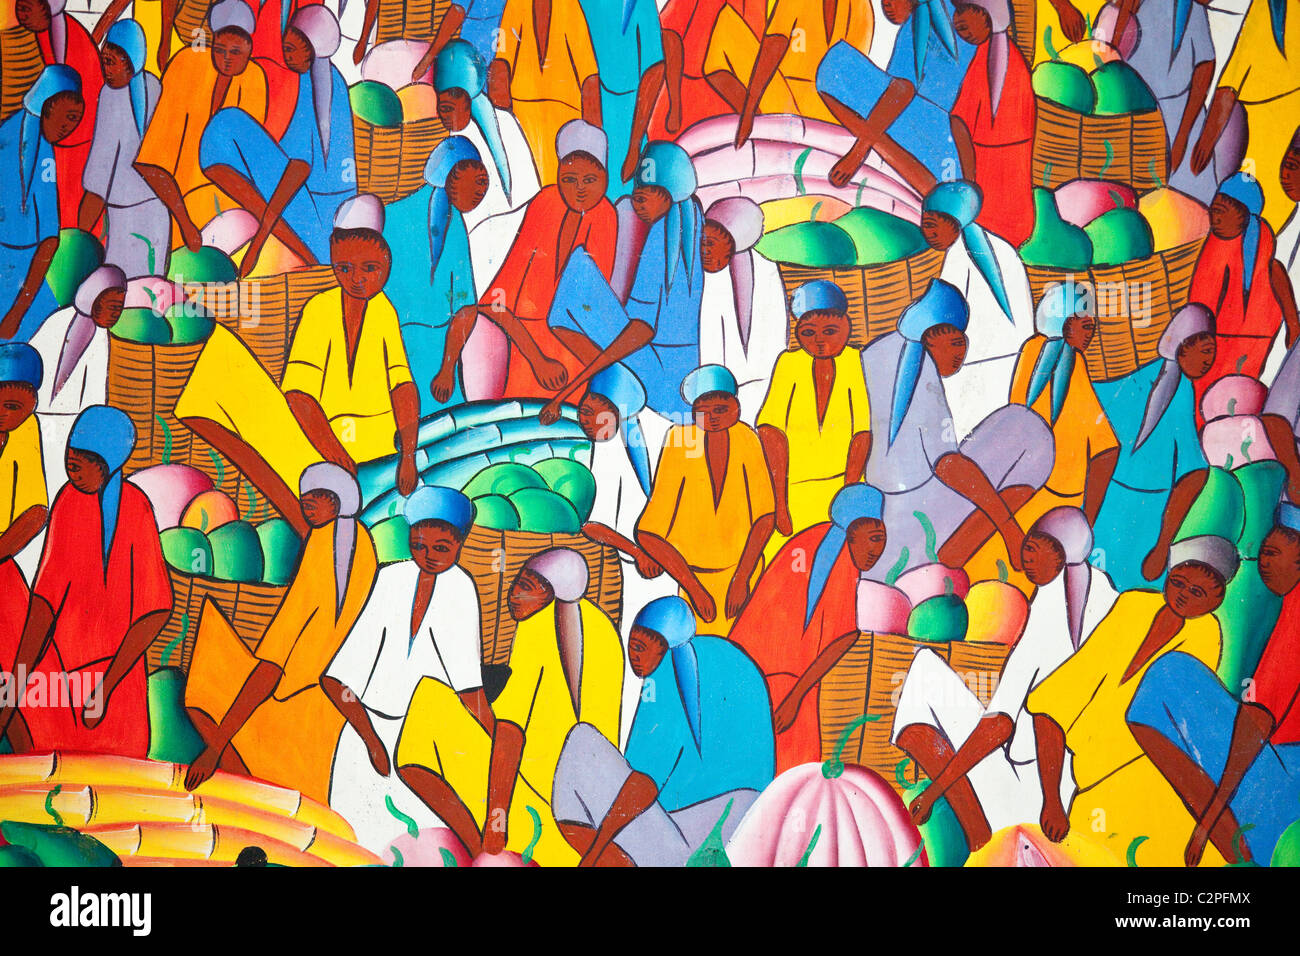 Haitian art paintings, Port-au-Prince, Haiti, by H Jackson - Stock Image